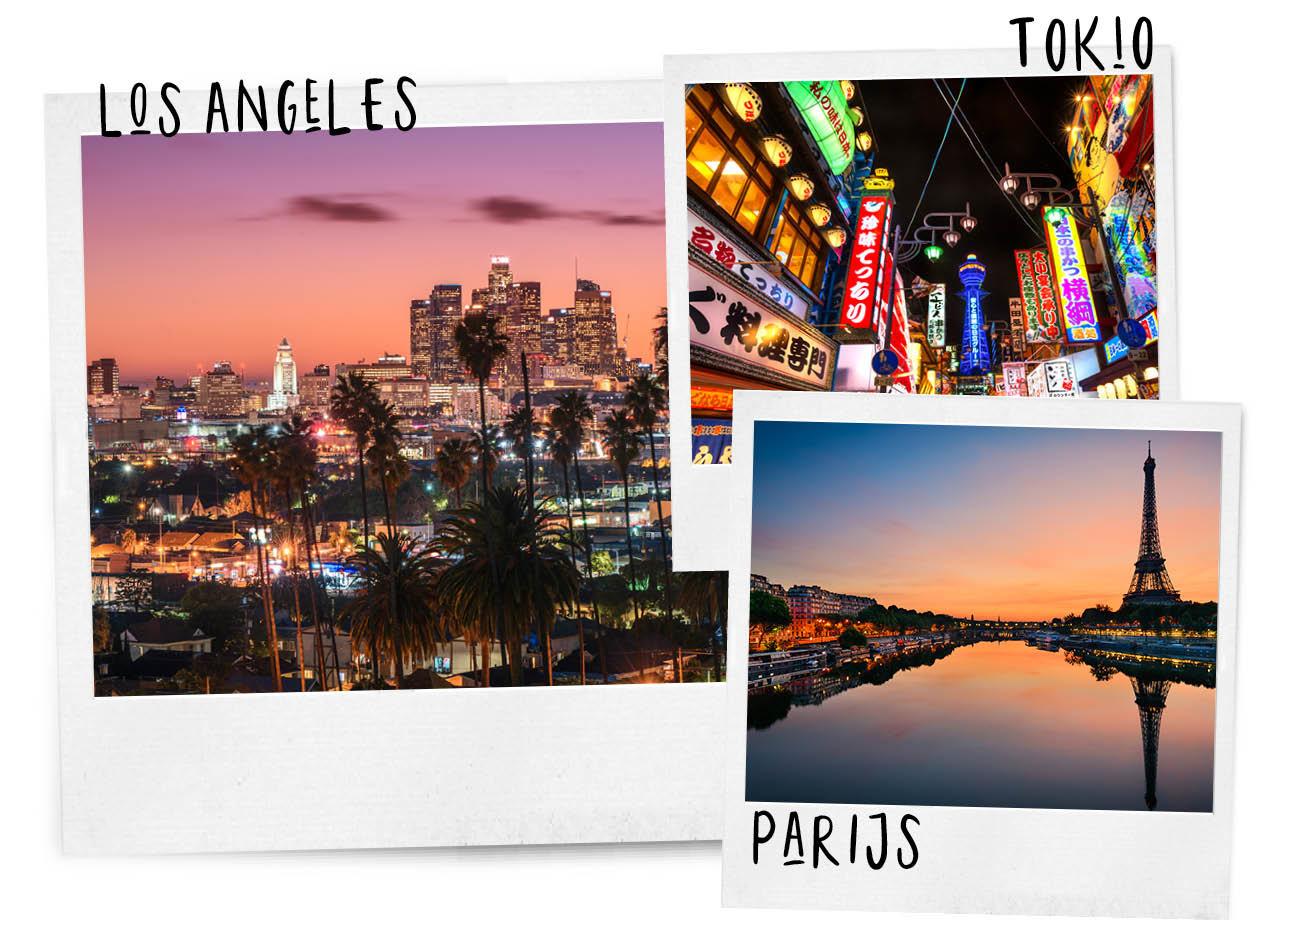 sunset over seine in parijs, sunset in los angeles met aplmbomen en lichtjes, tokio by night met alle lichtgevende borden